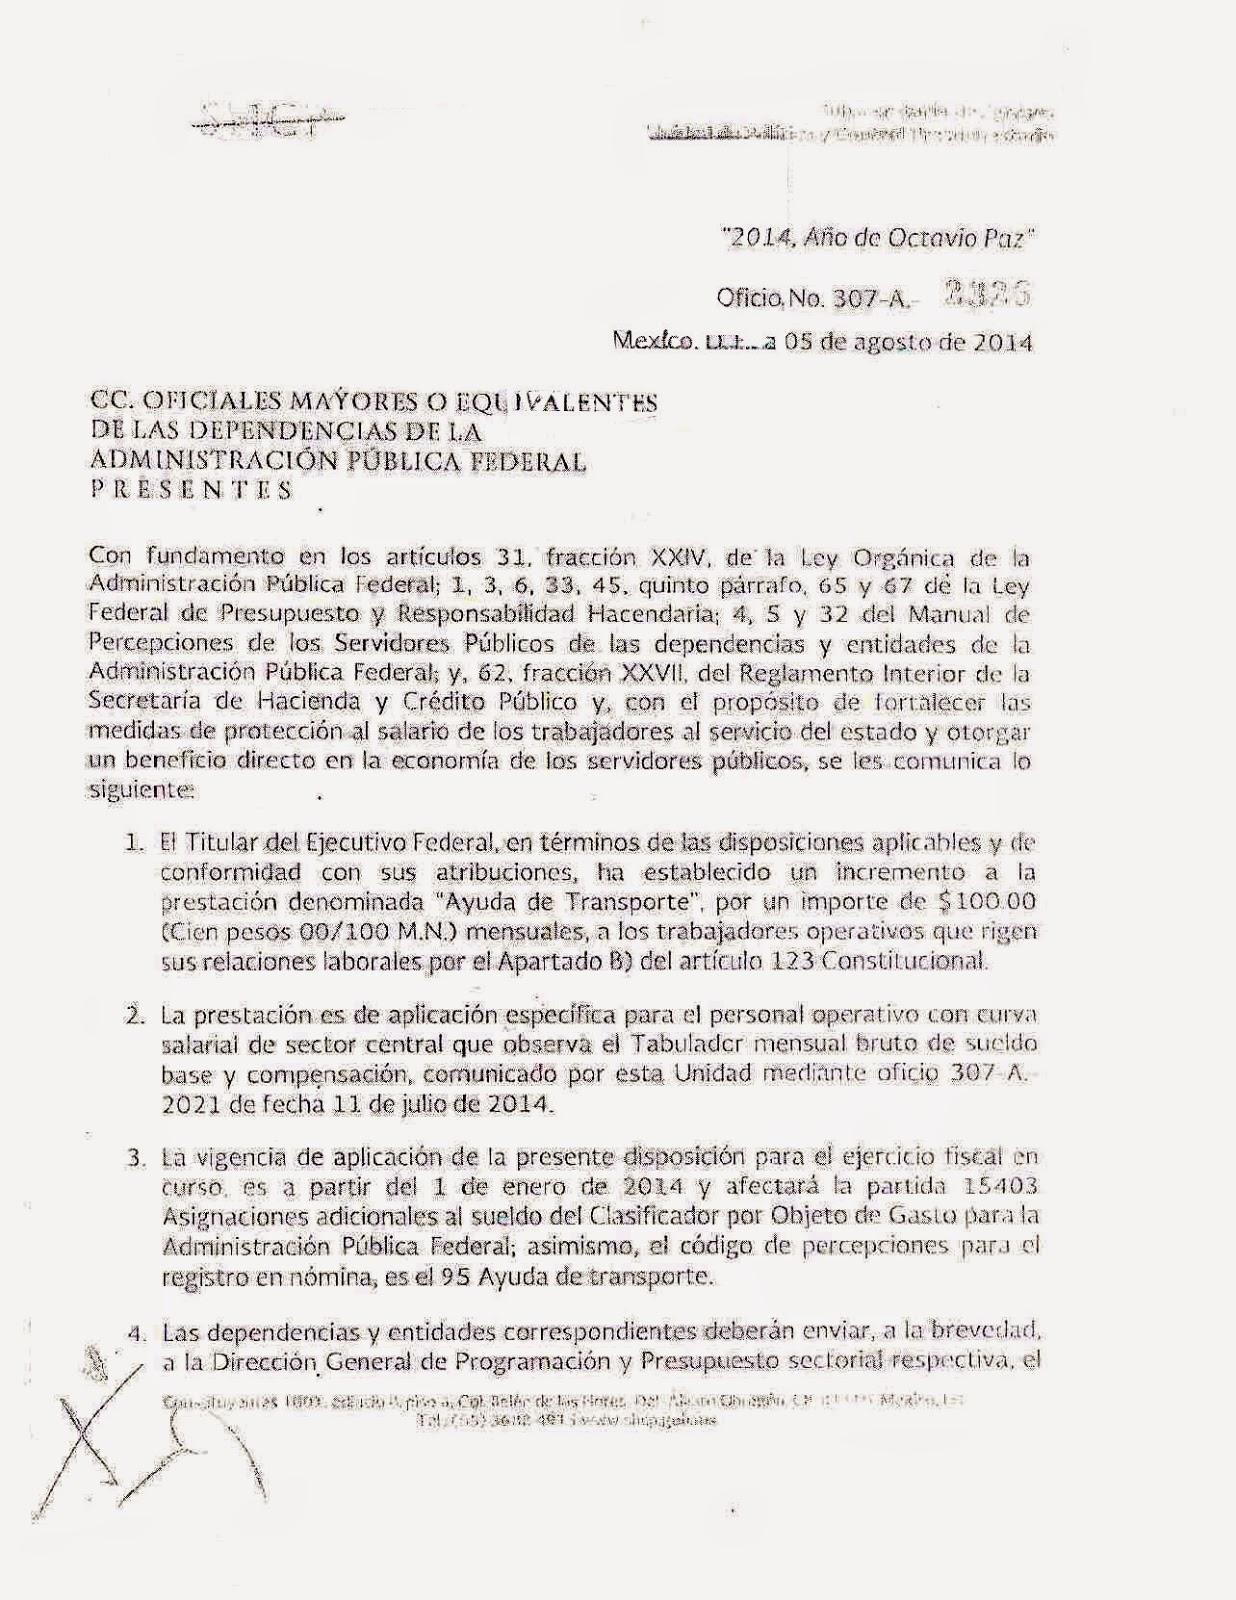 http://sindet-sedatu.org.mx/web/doctos/Ayuda_de_Transporte_SHCP.pdf